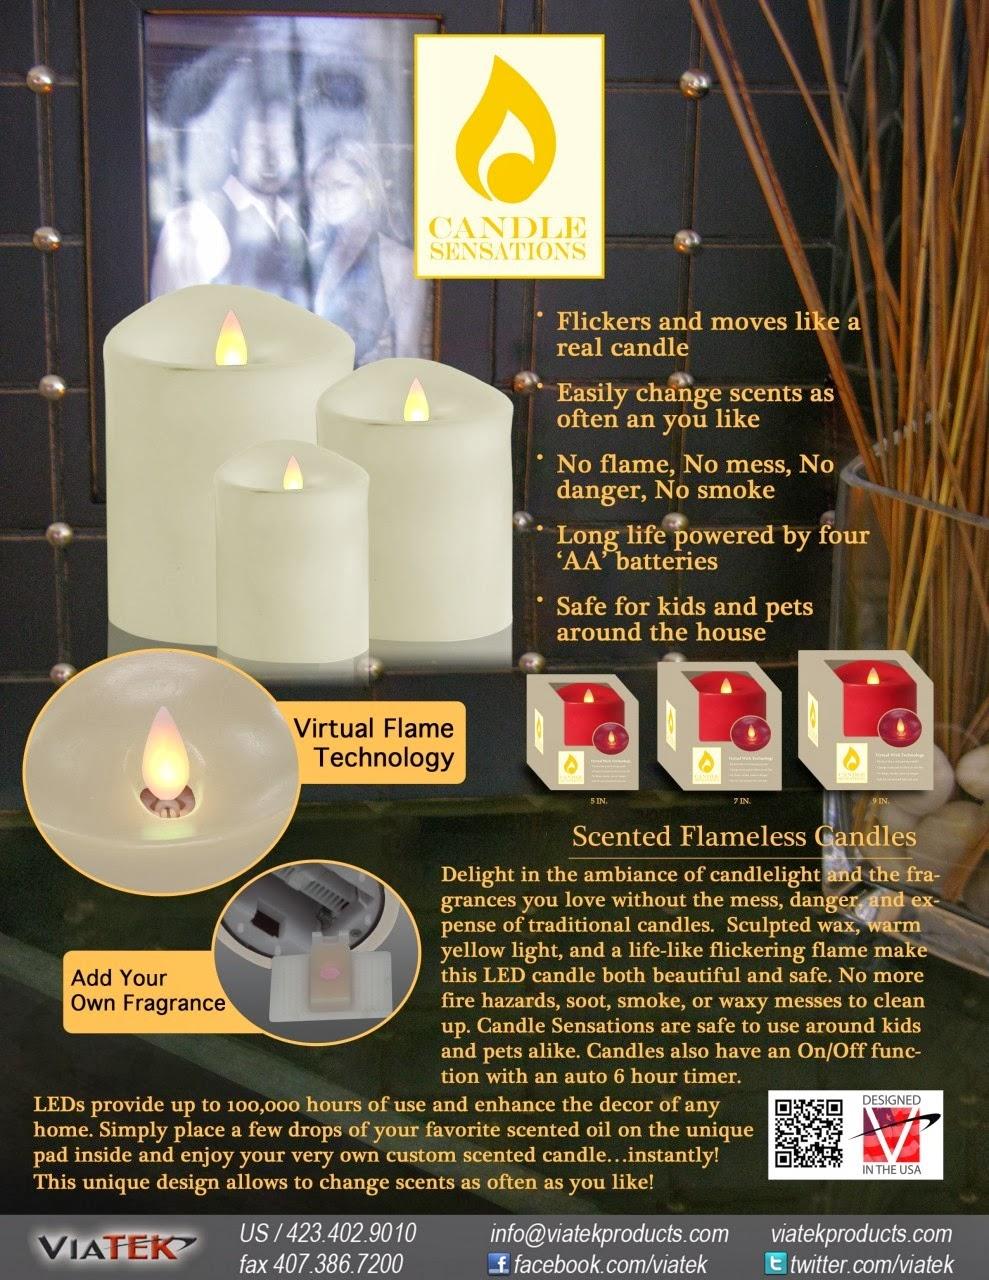 Candle Sensations